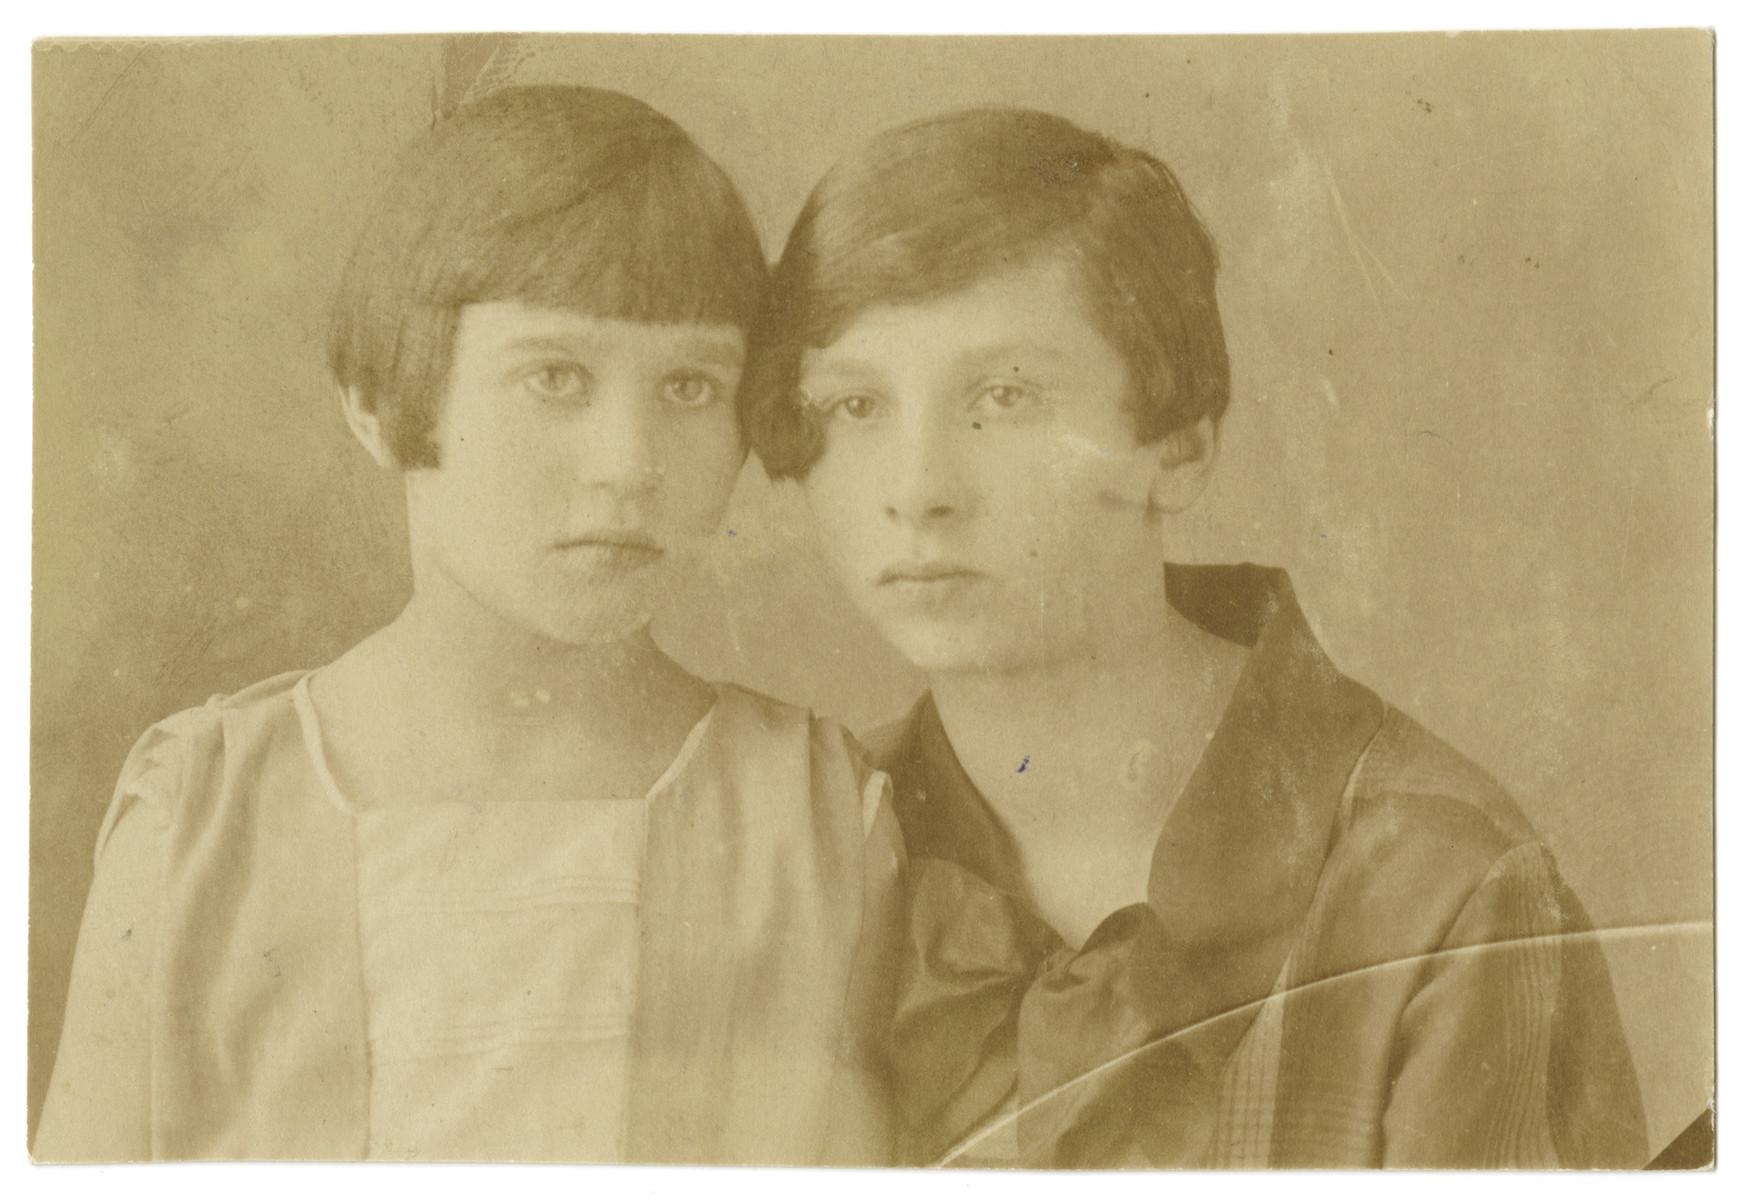 Deborah-Miriam Meirtal and her sister Sheine-Chinde Meirtal.